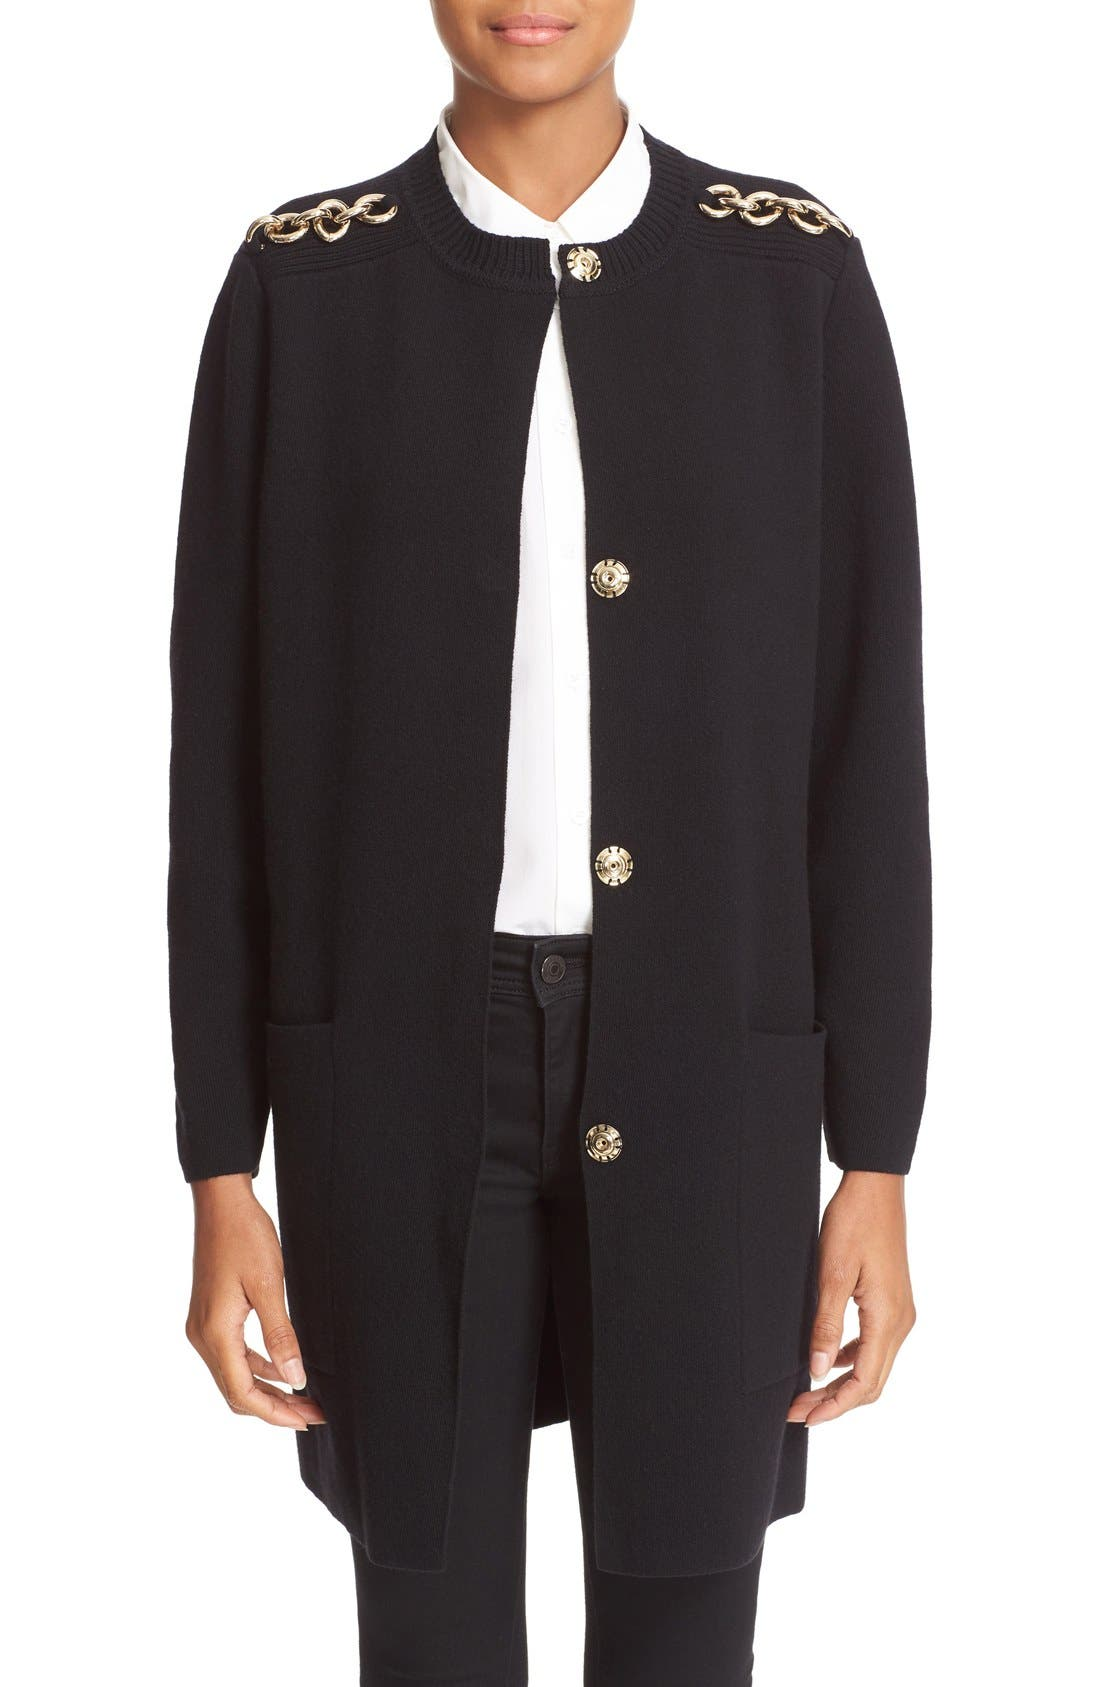 Alternate Image 1 Selected - Burberry Colbybrook Wool Blend Cardigan